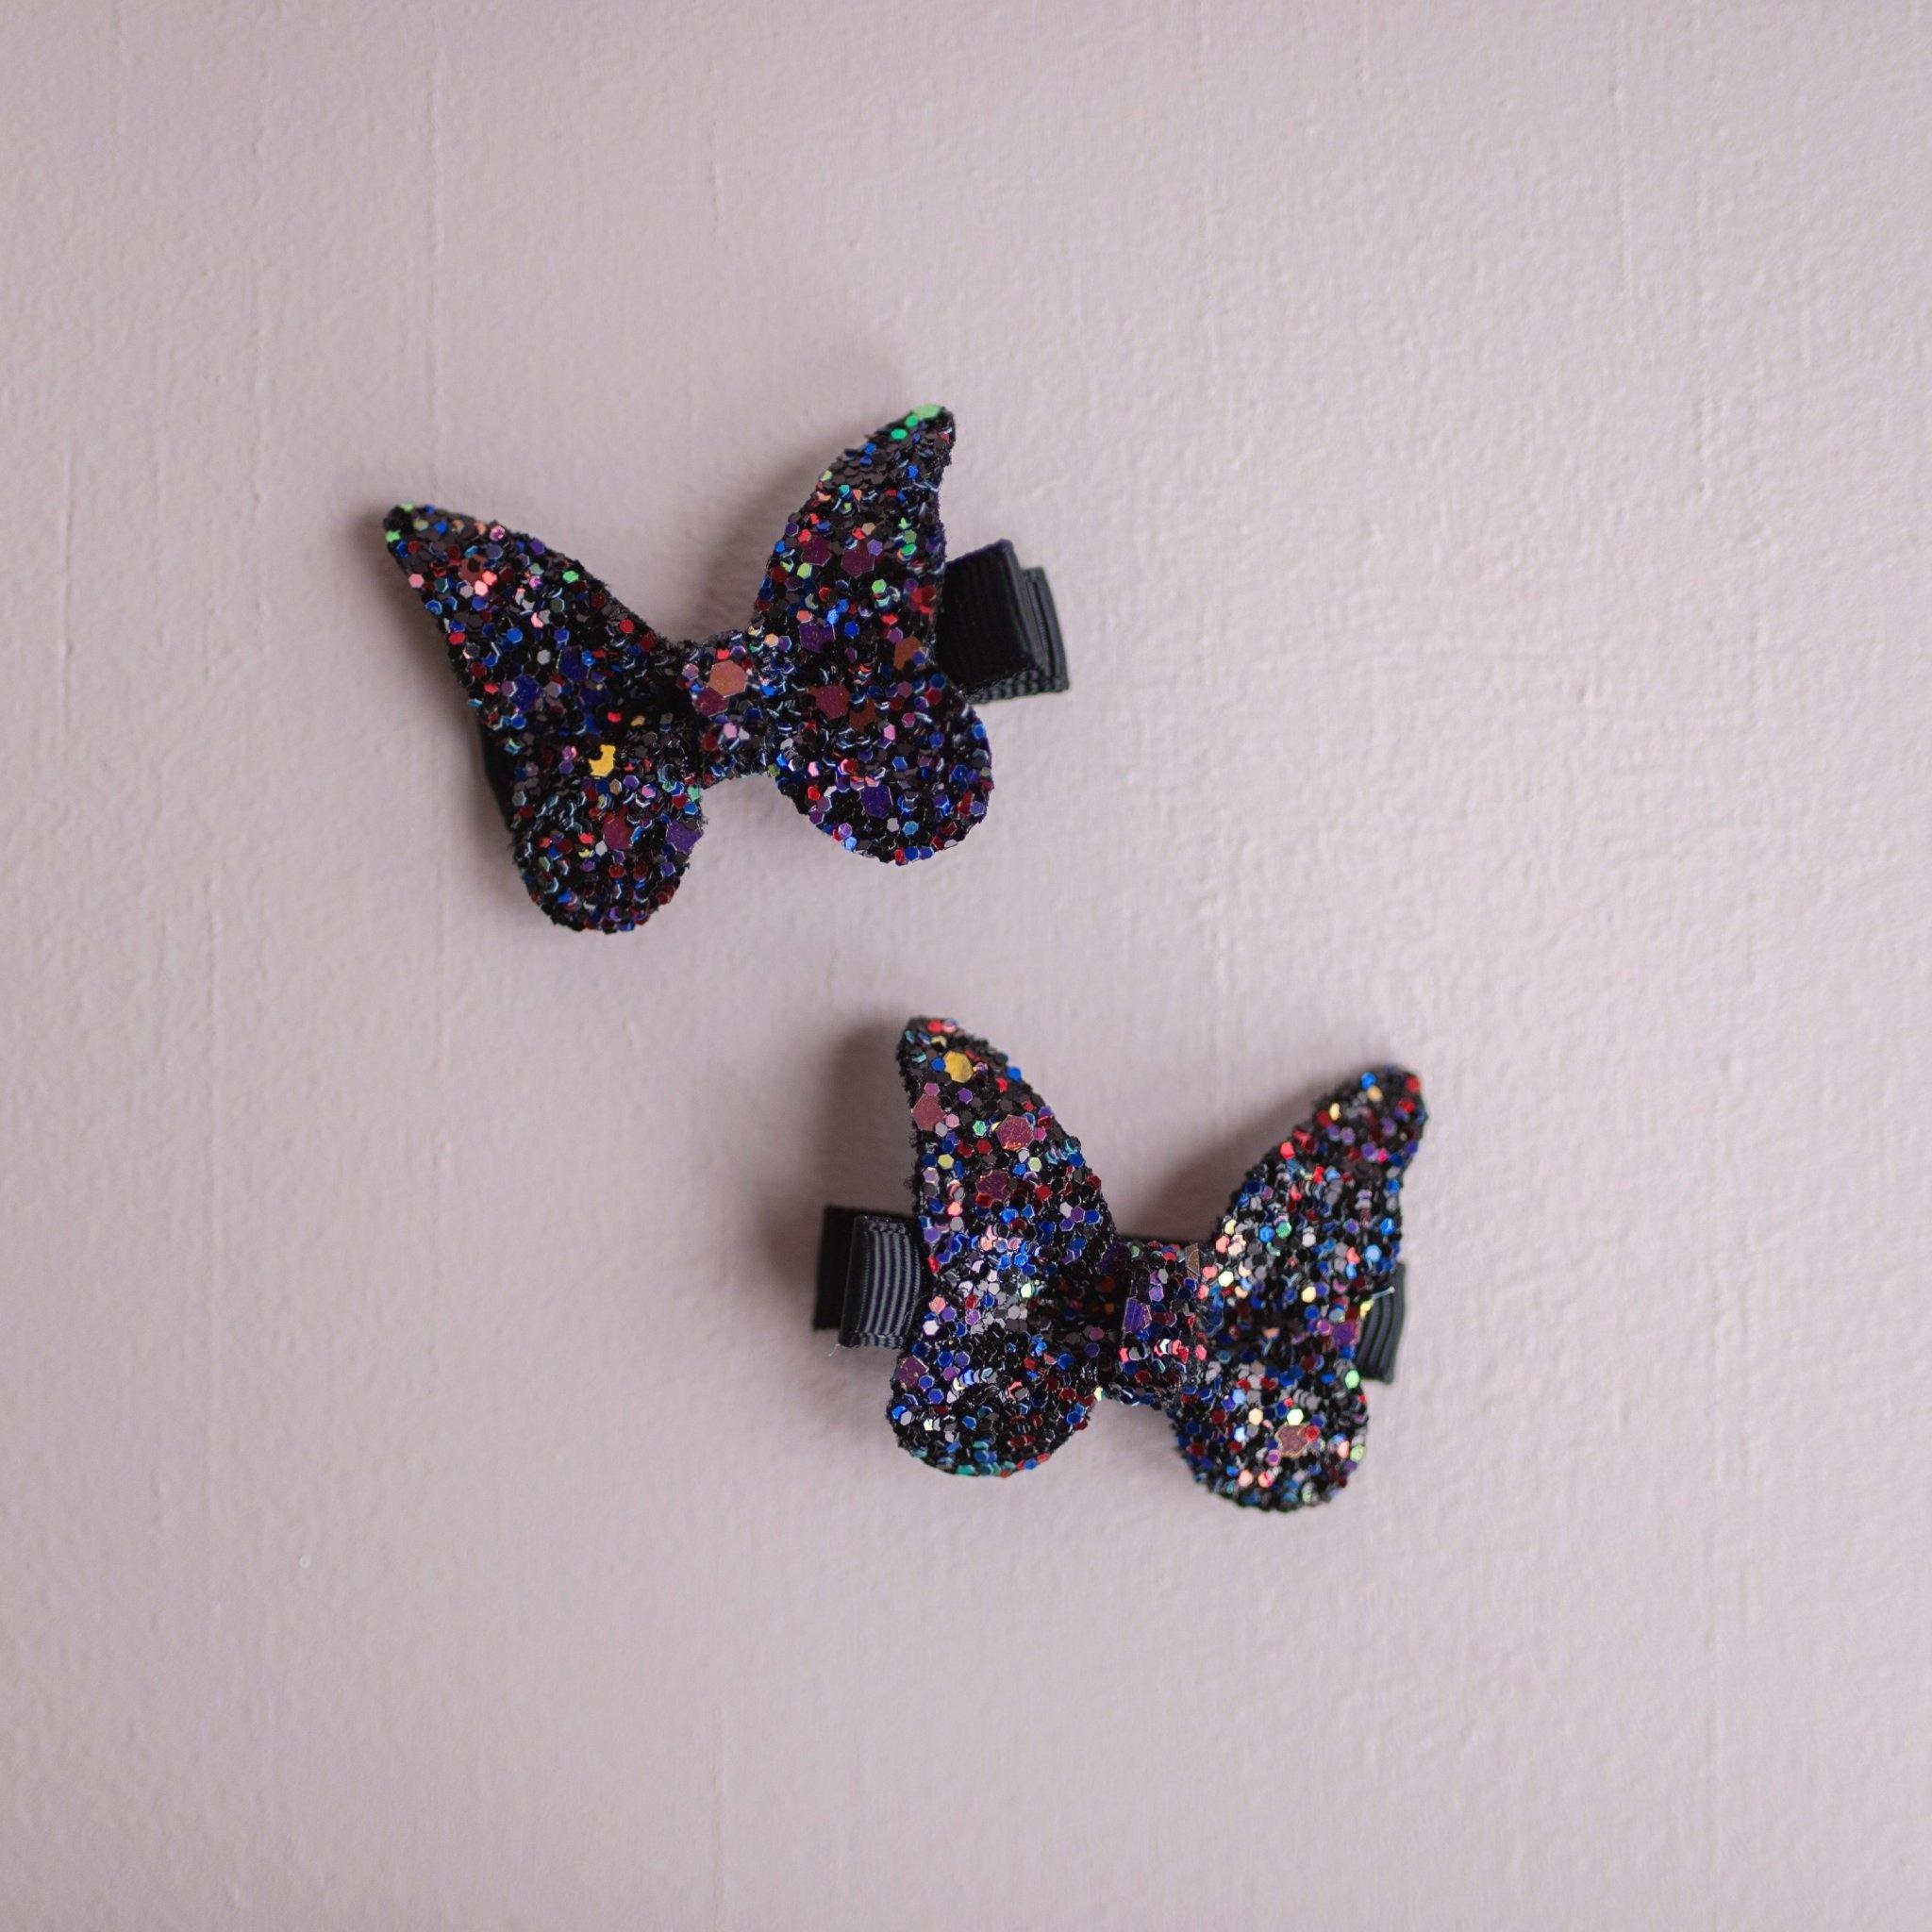 Rockstar Butterfly Hair Clip (1 pc)-3